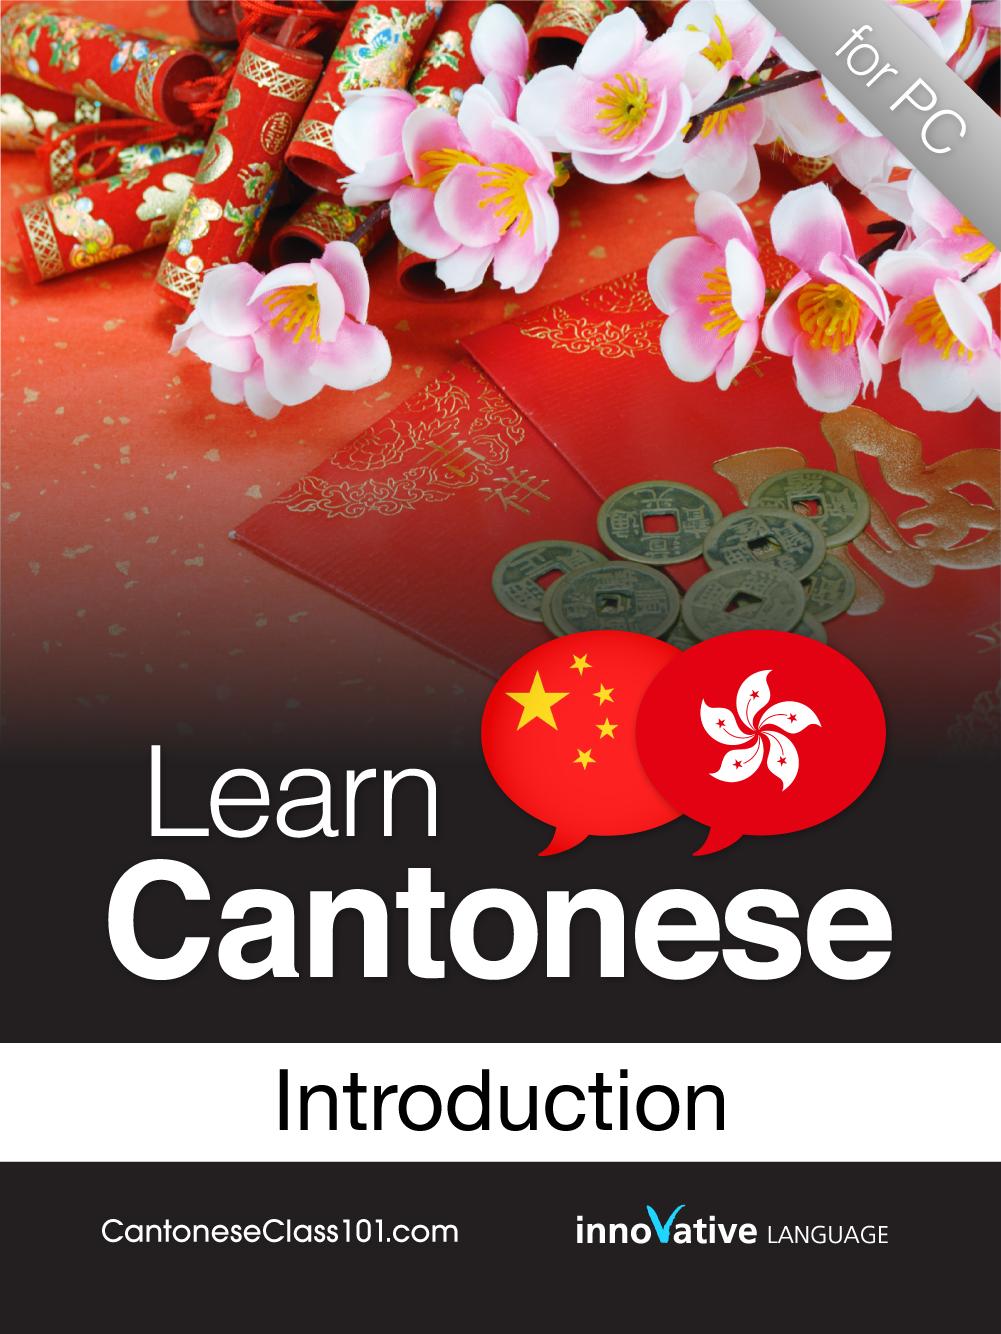 Cantonese - Wikipedia